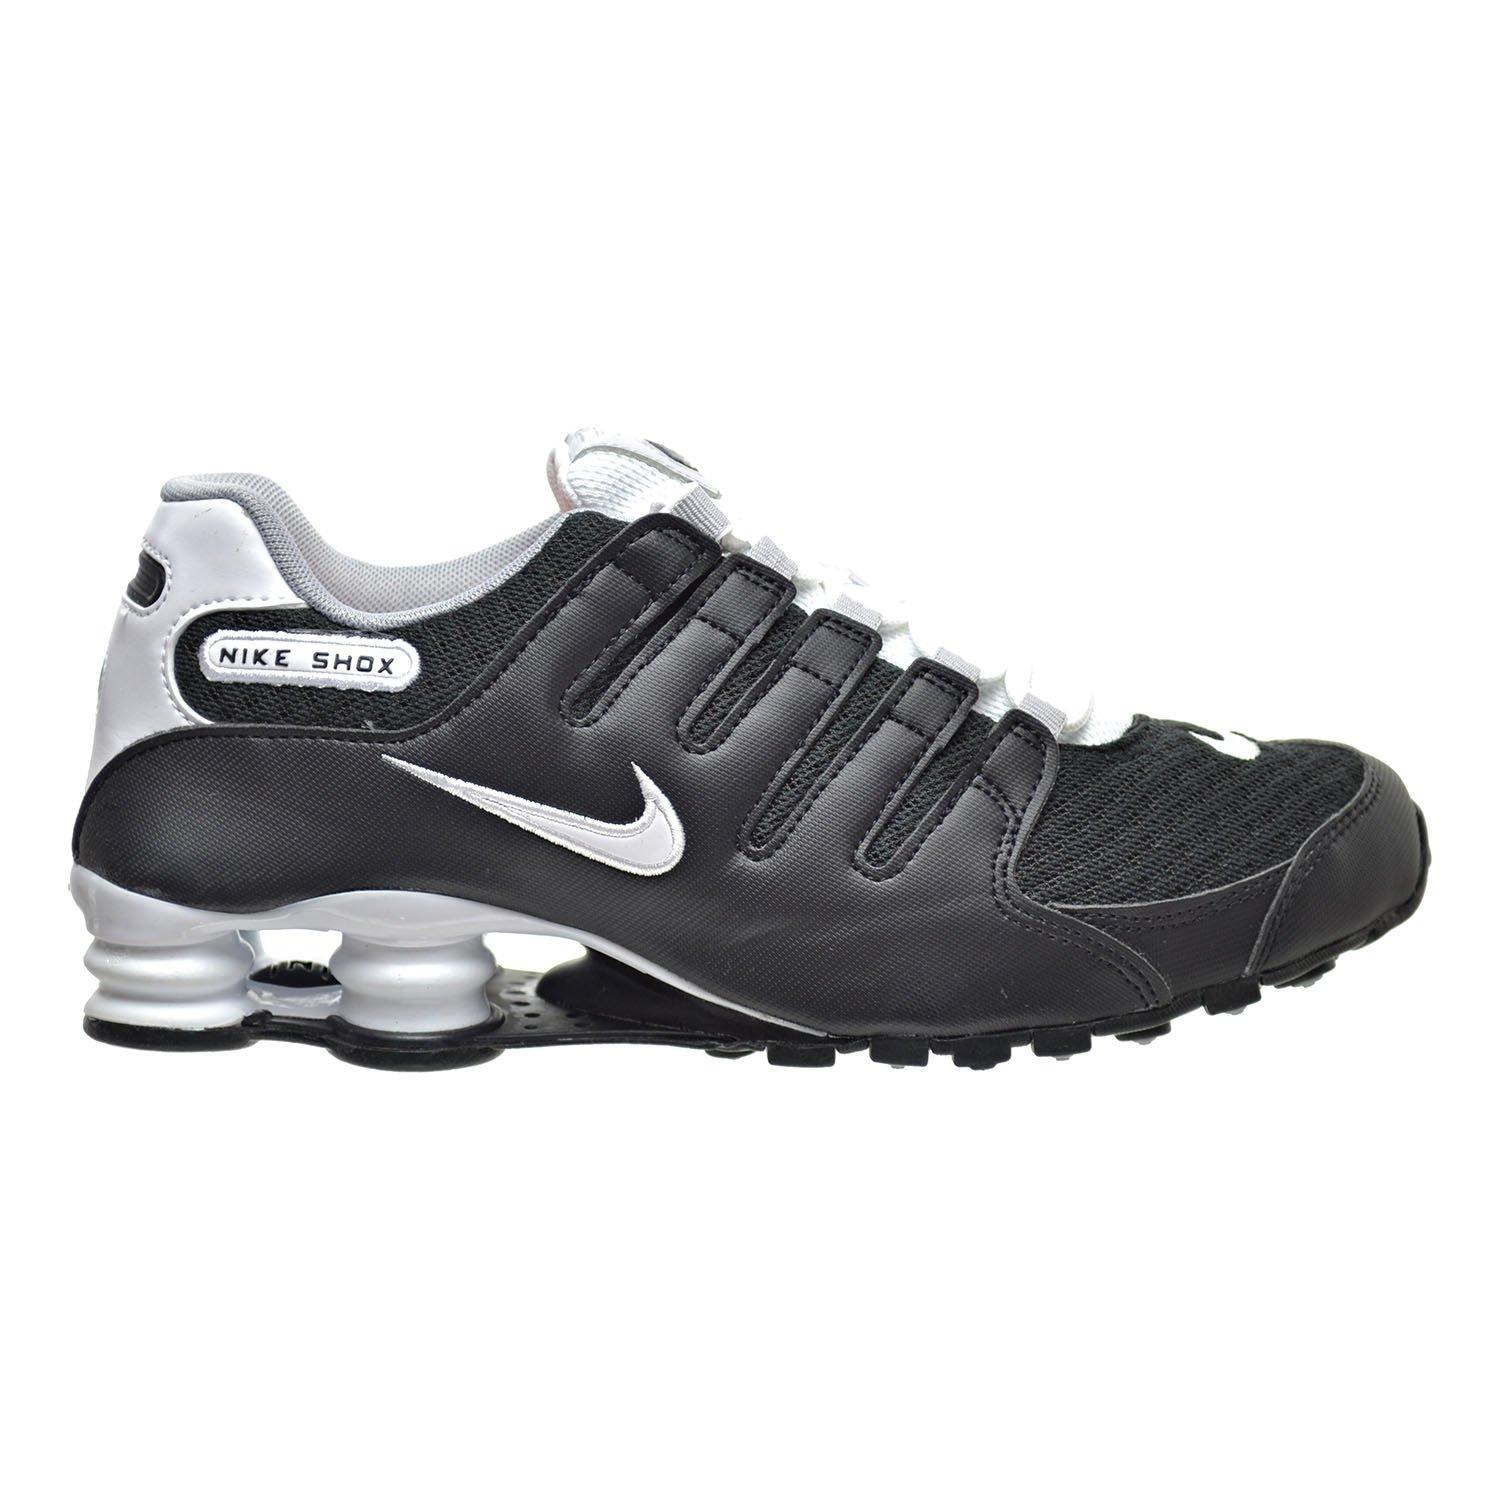 9930d138cdf9fb Provide Nike Shox NZ SE Men Shoes Black White Wolf Grey Shoes Black White